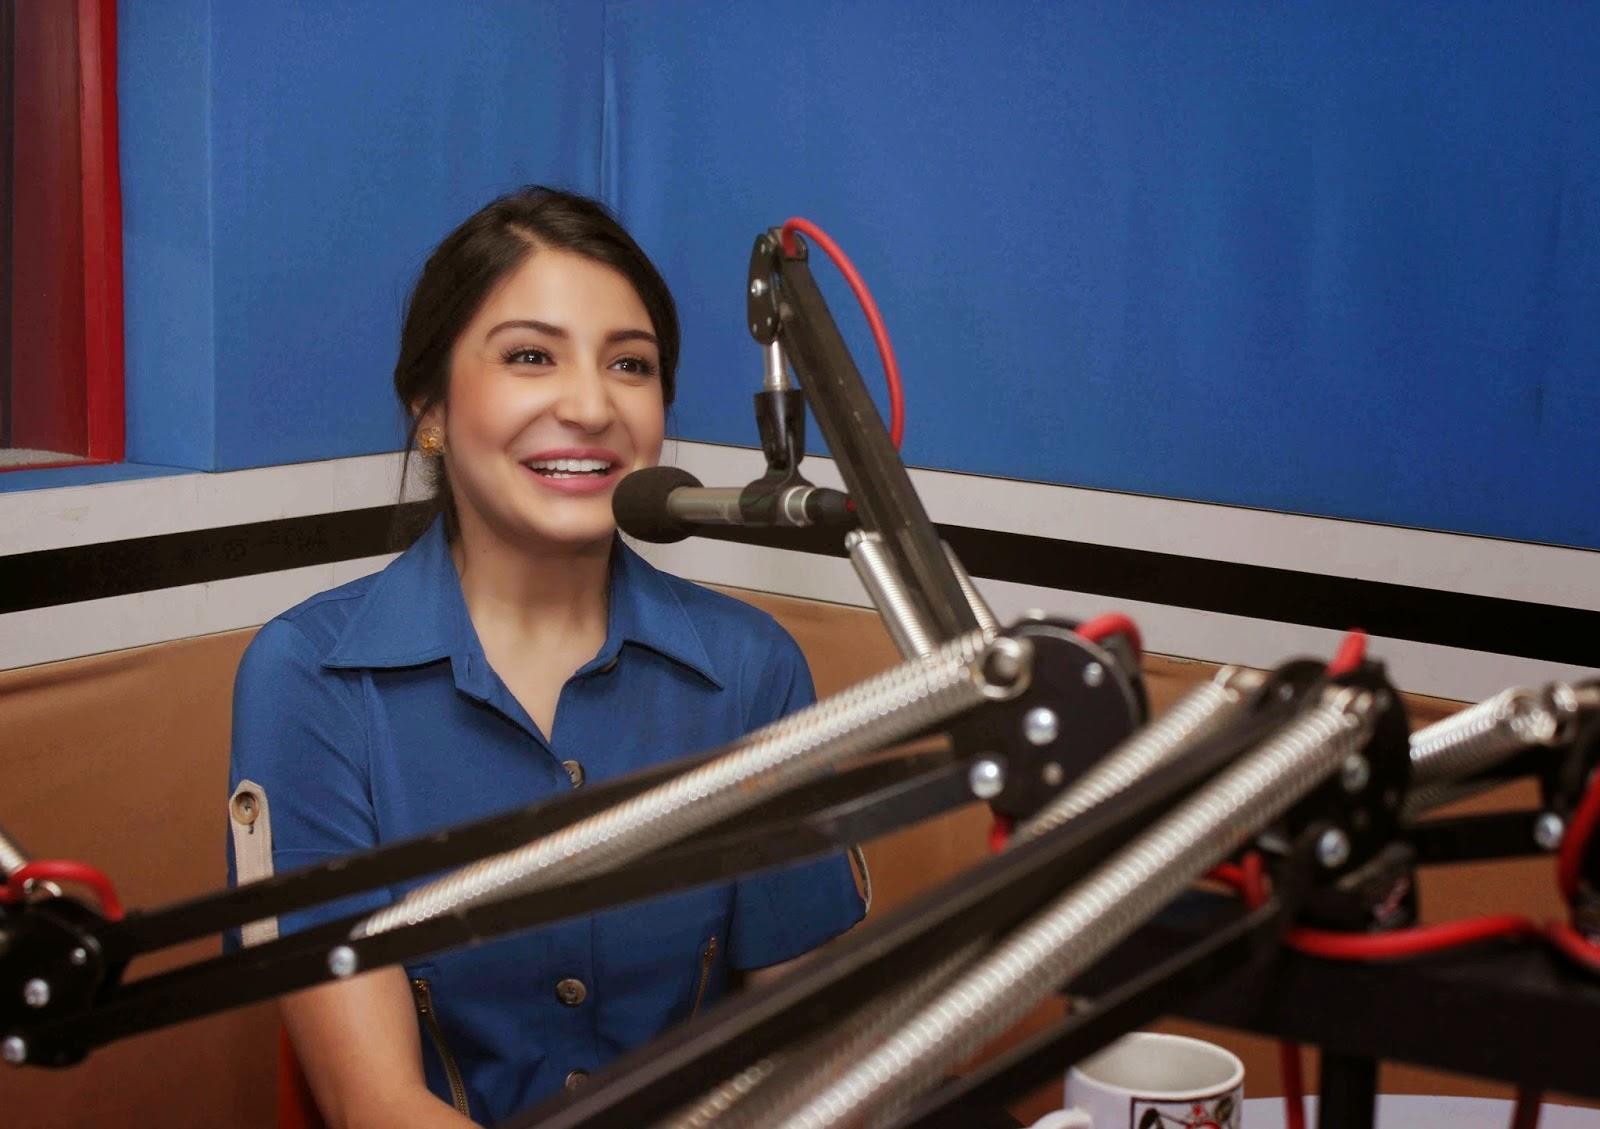 Anushka Sharma izgleda seksi v modri obleki Hd - slike-3890